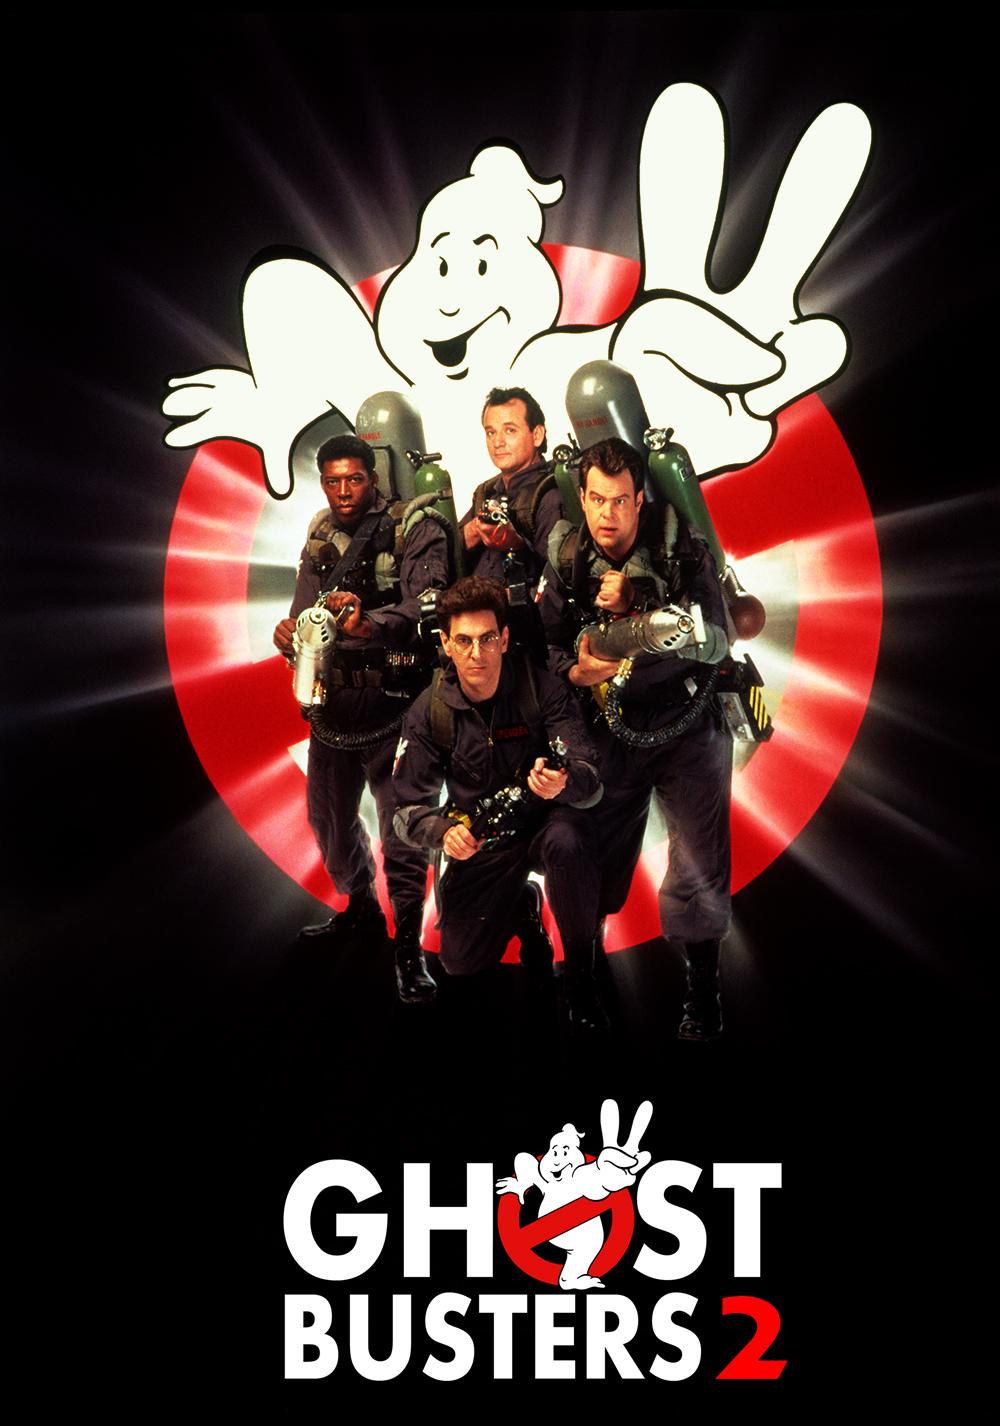 Ghostbusters 2 Online Free